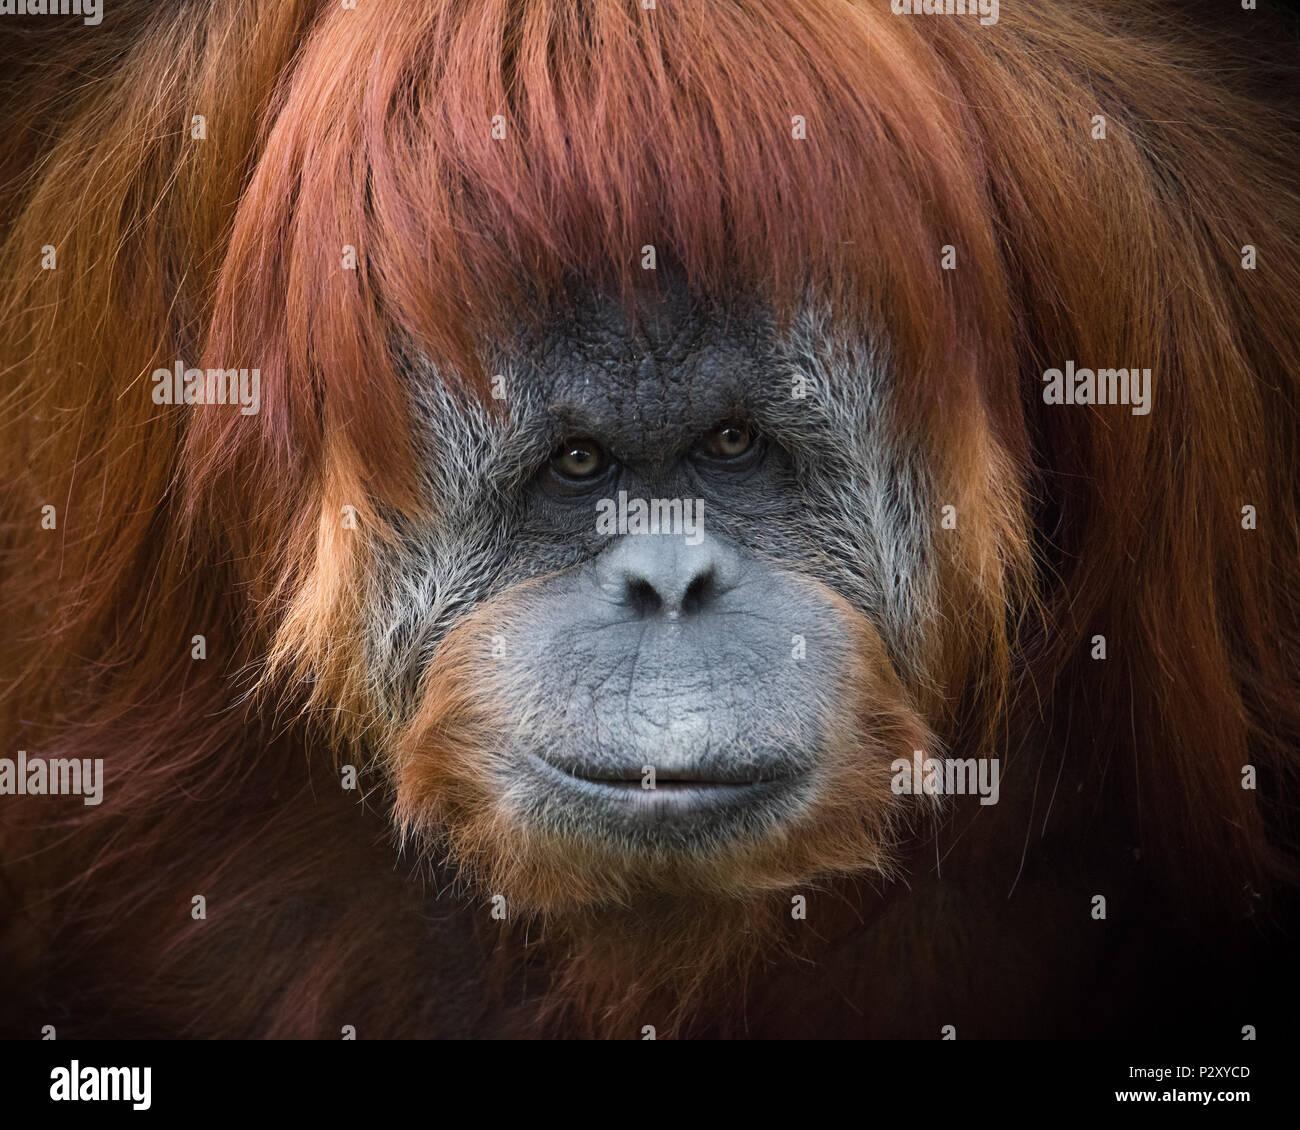 A captive Sumatran Orangutan at a zoo in South Australia.  Sumatran Orangutans are critically endangered due to habitat loss for palm oil plantations. Stock Photo